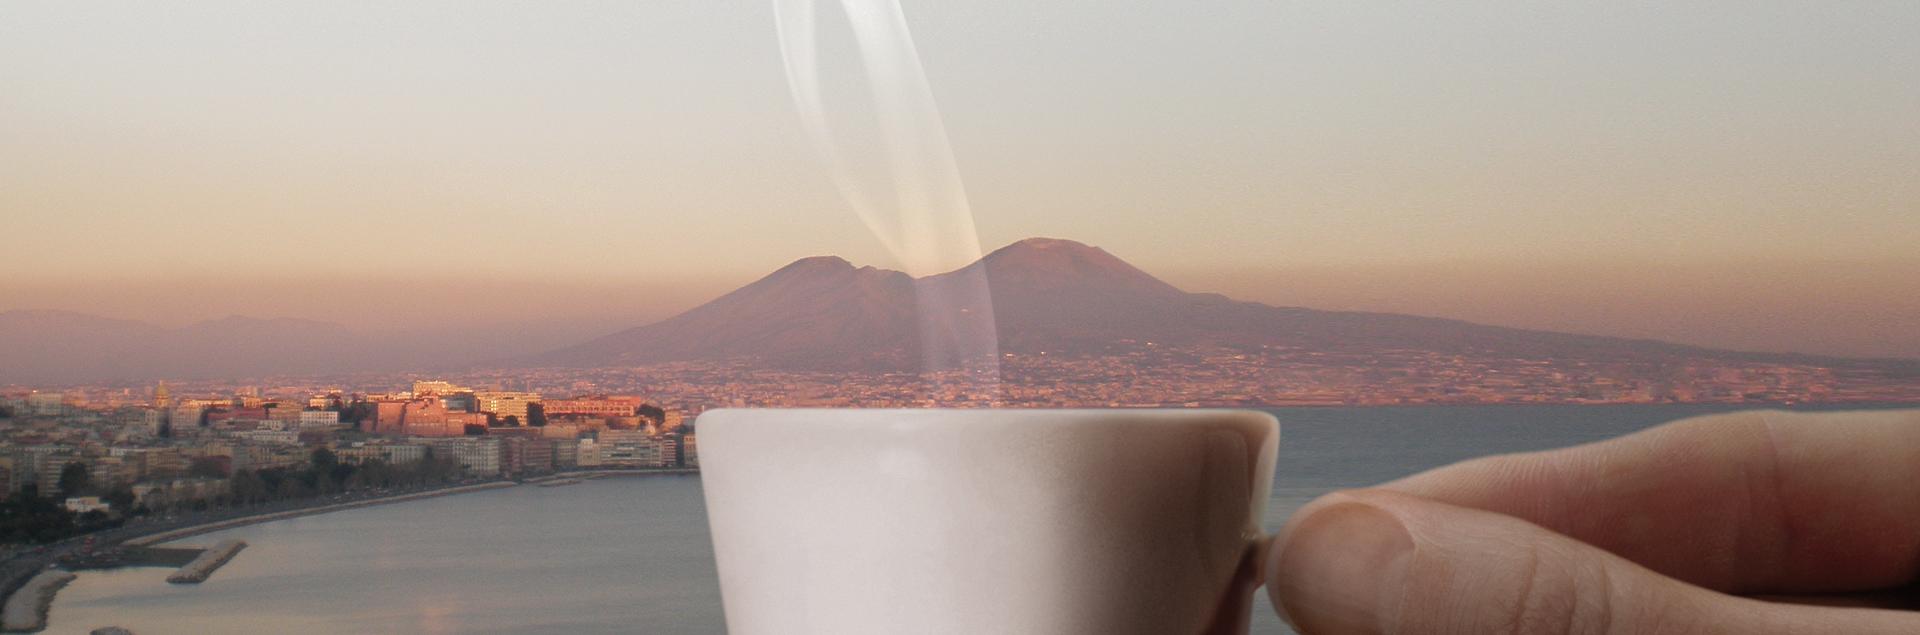 Kimbo...любимый кофе